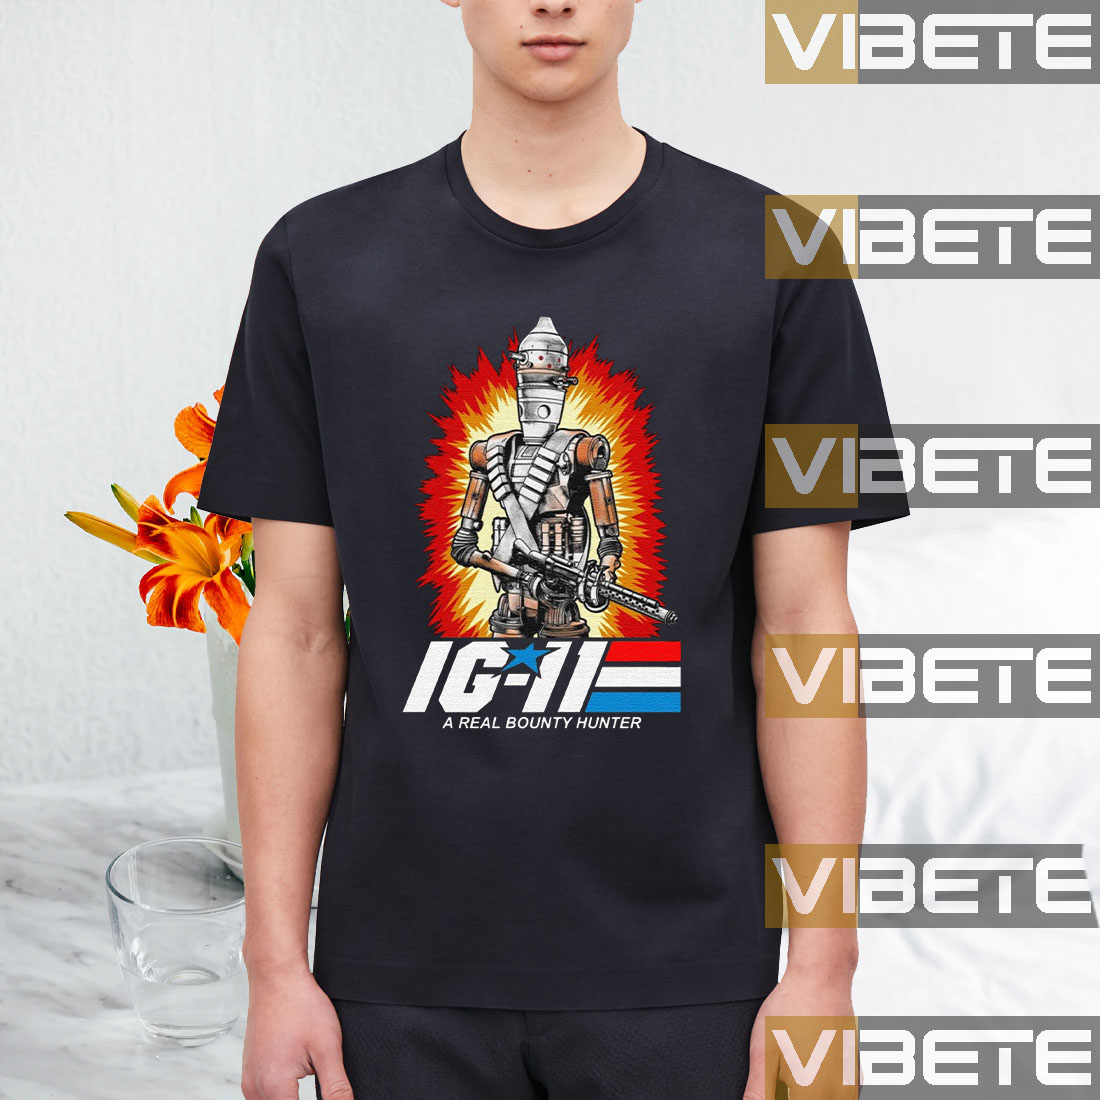 A REAL BOUNTY HUNTER T-Shirt